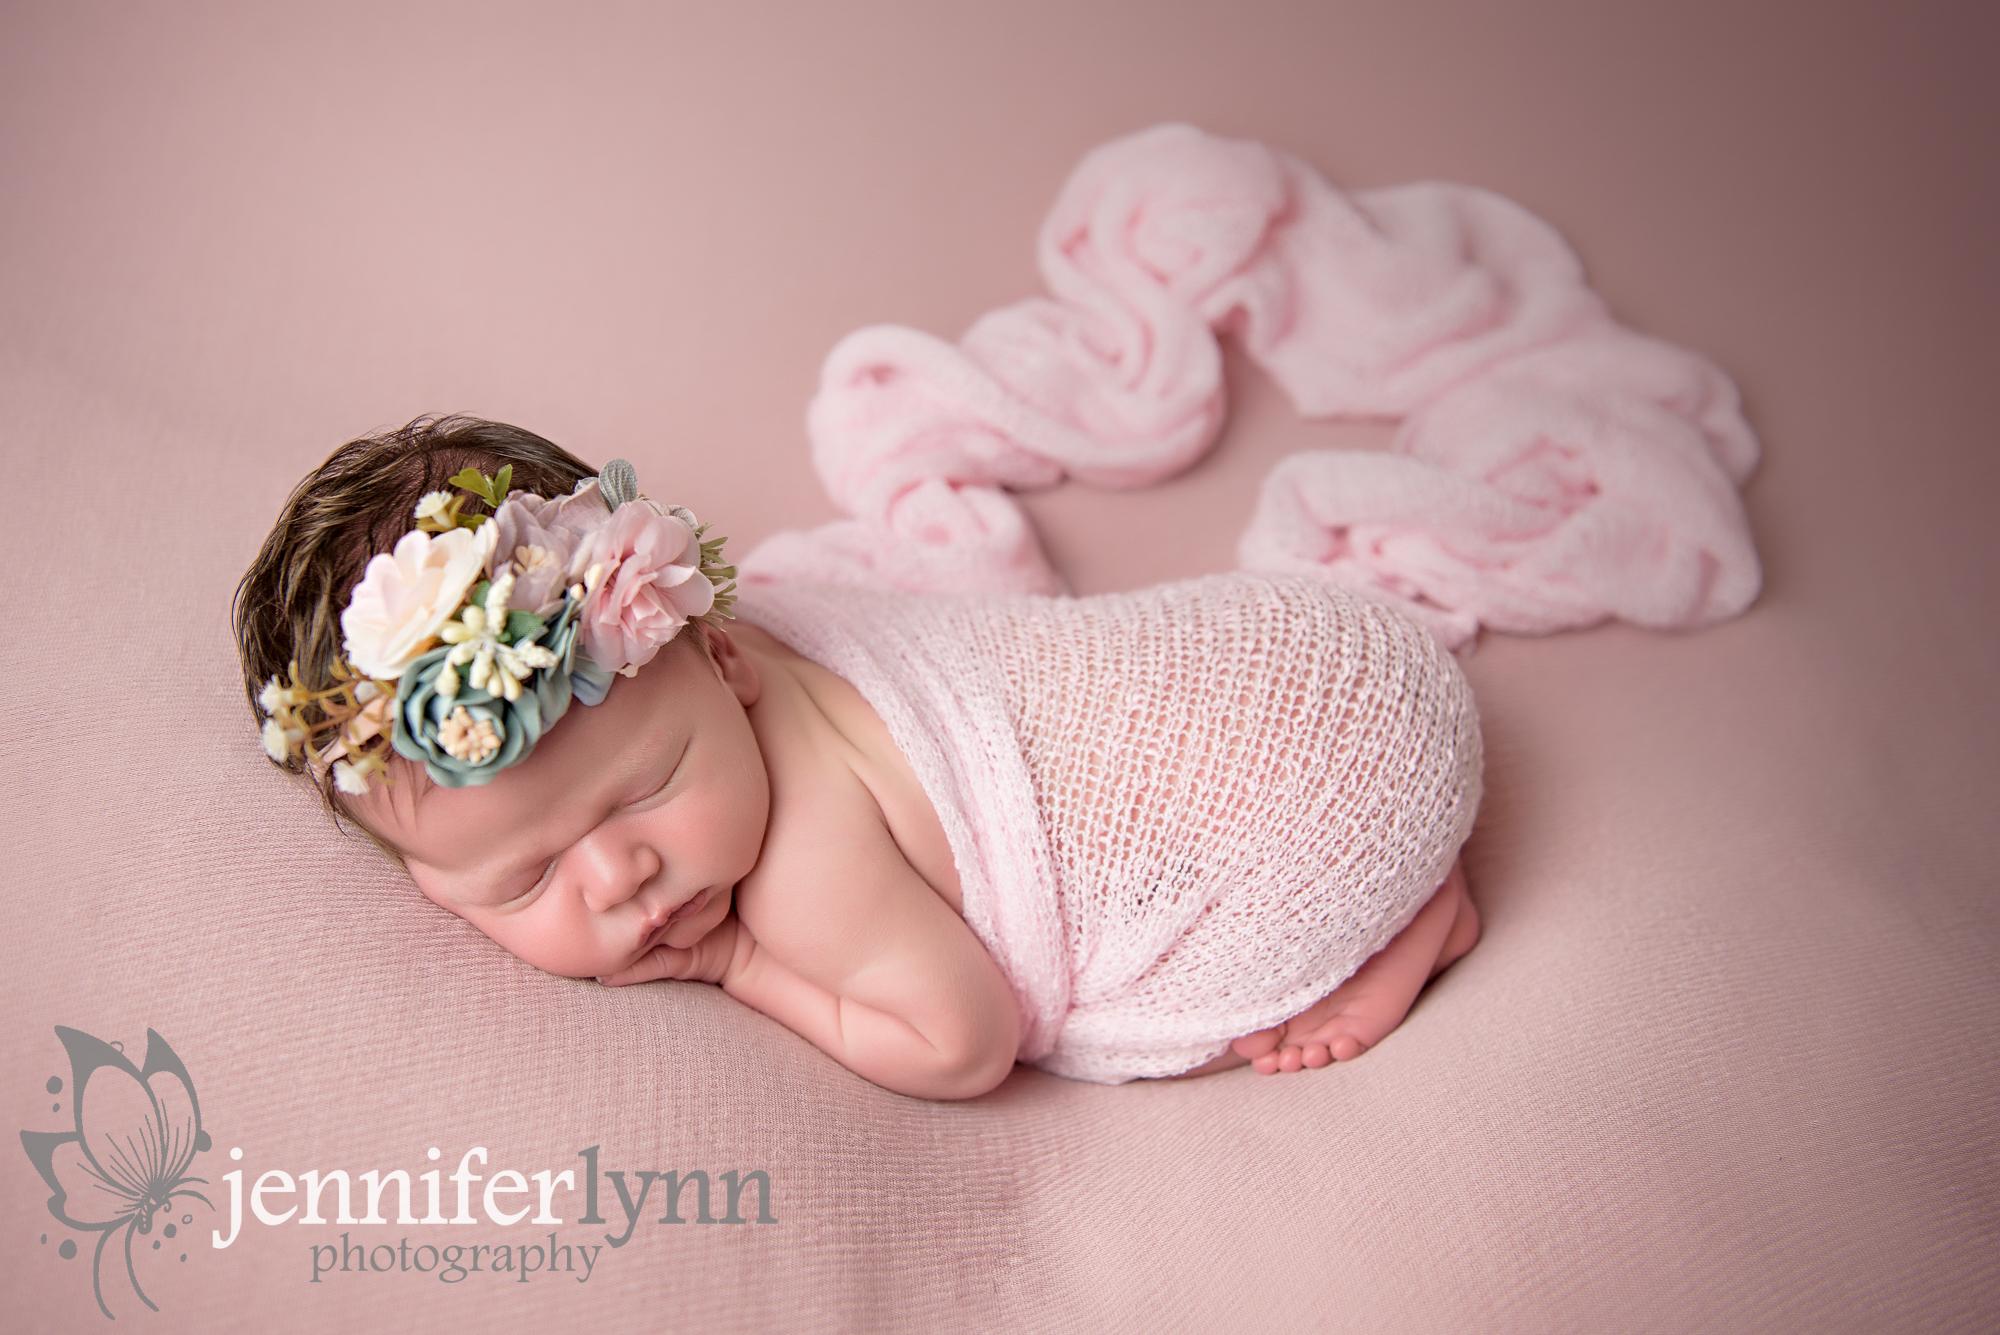 Newborn Girl Pink Fabric and Flowers